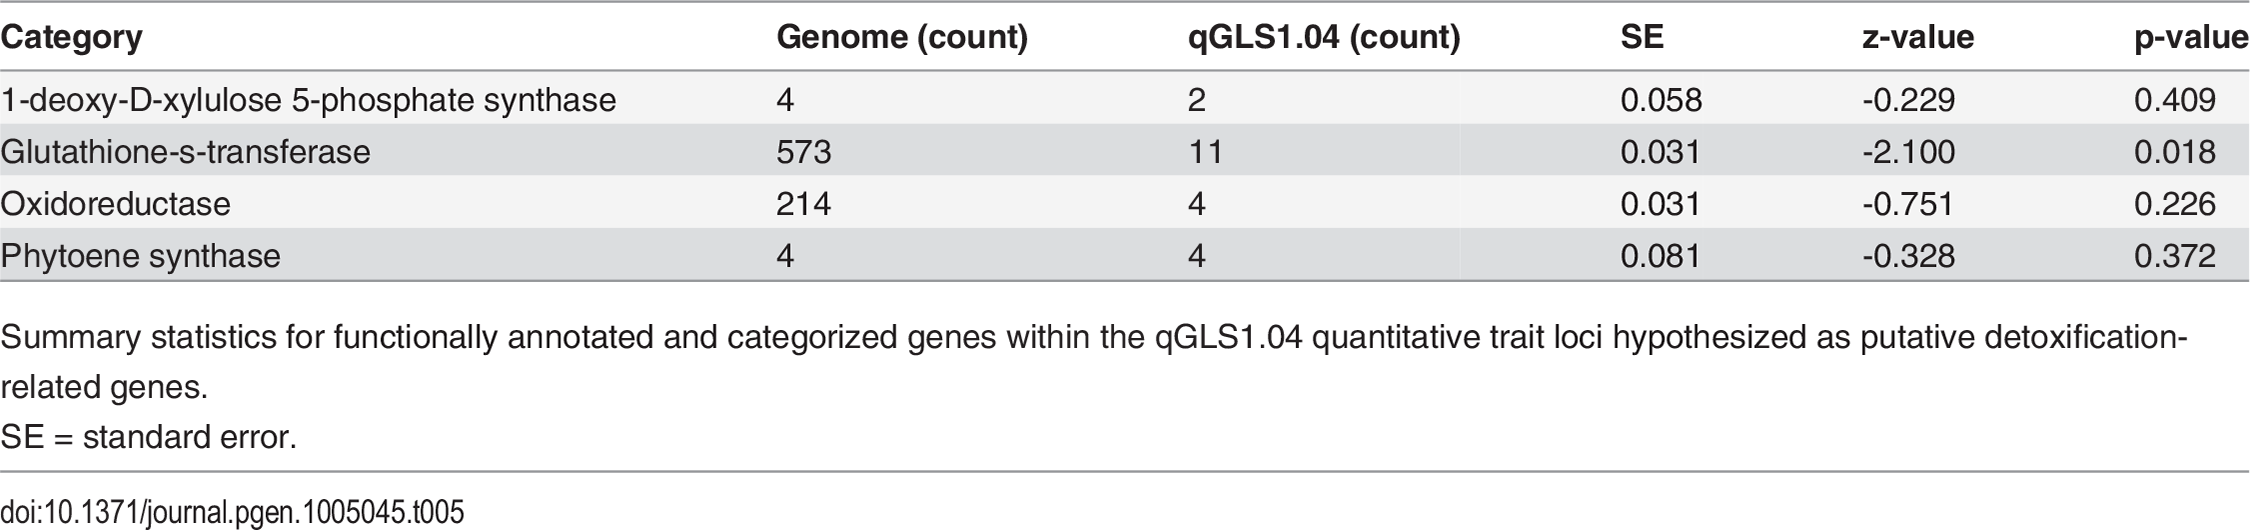 Summary statistics for detoxification-related genes underlying qGLS1.04.